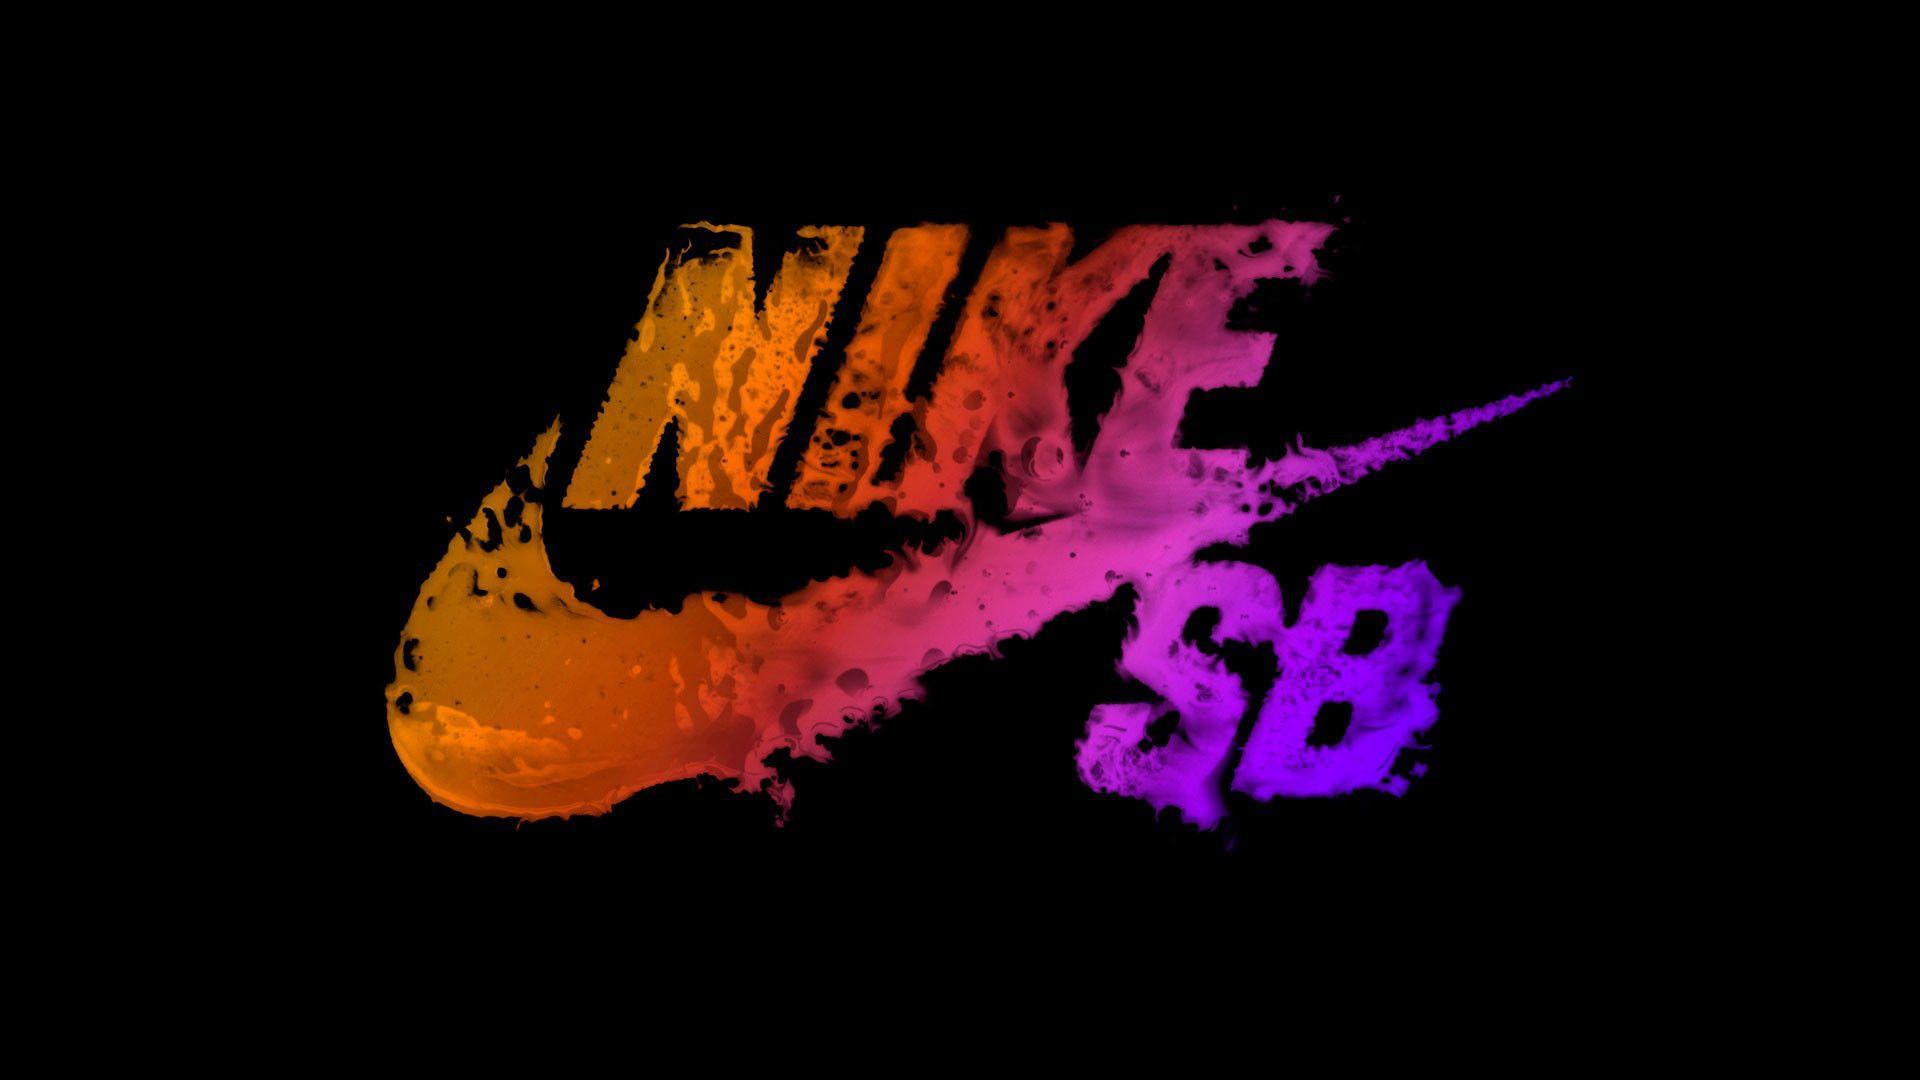 Nike Art Wallpapers - Top Free Nike Art ...